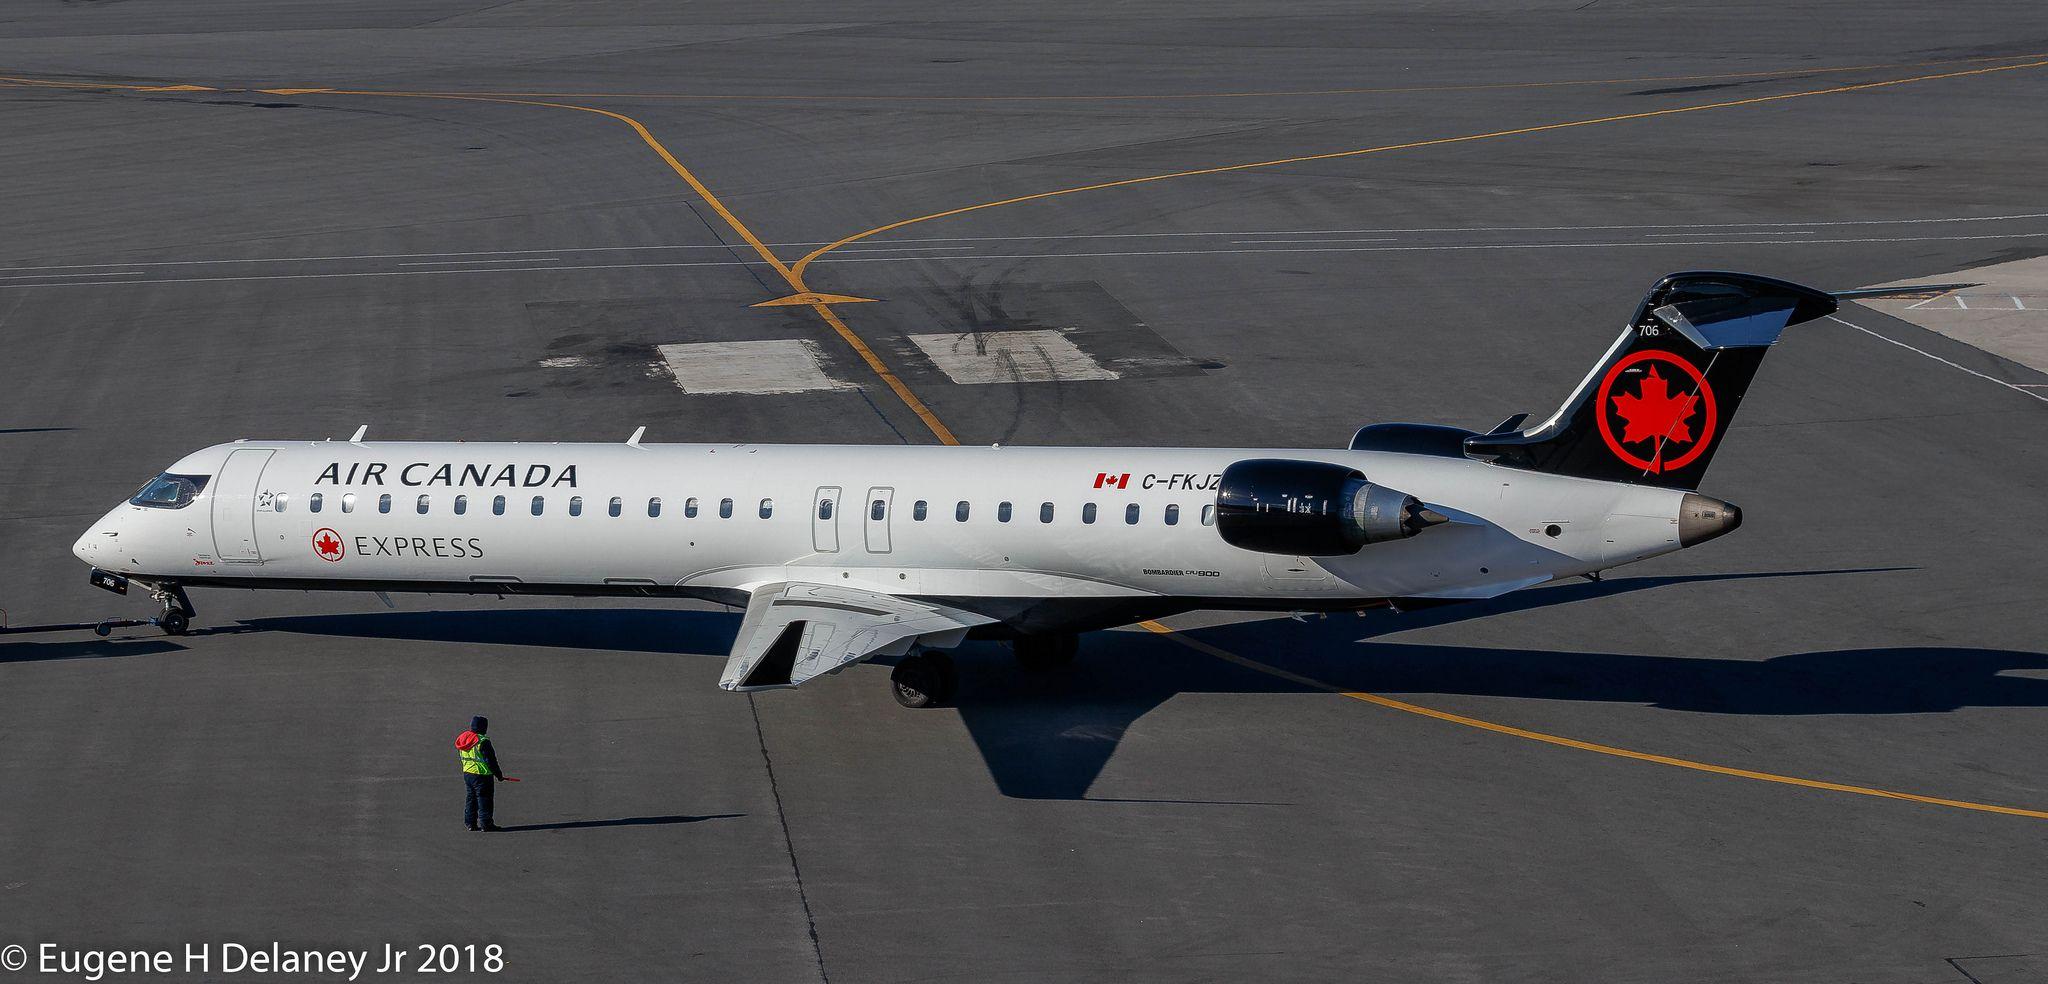 Pin on Embraer/Bombadier/Sukhoi/Mitsubishi Jets